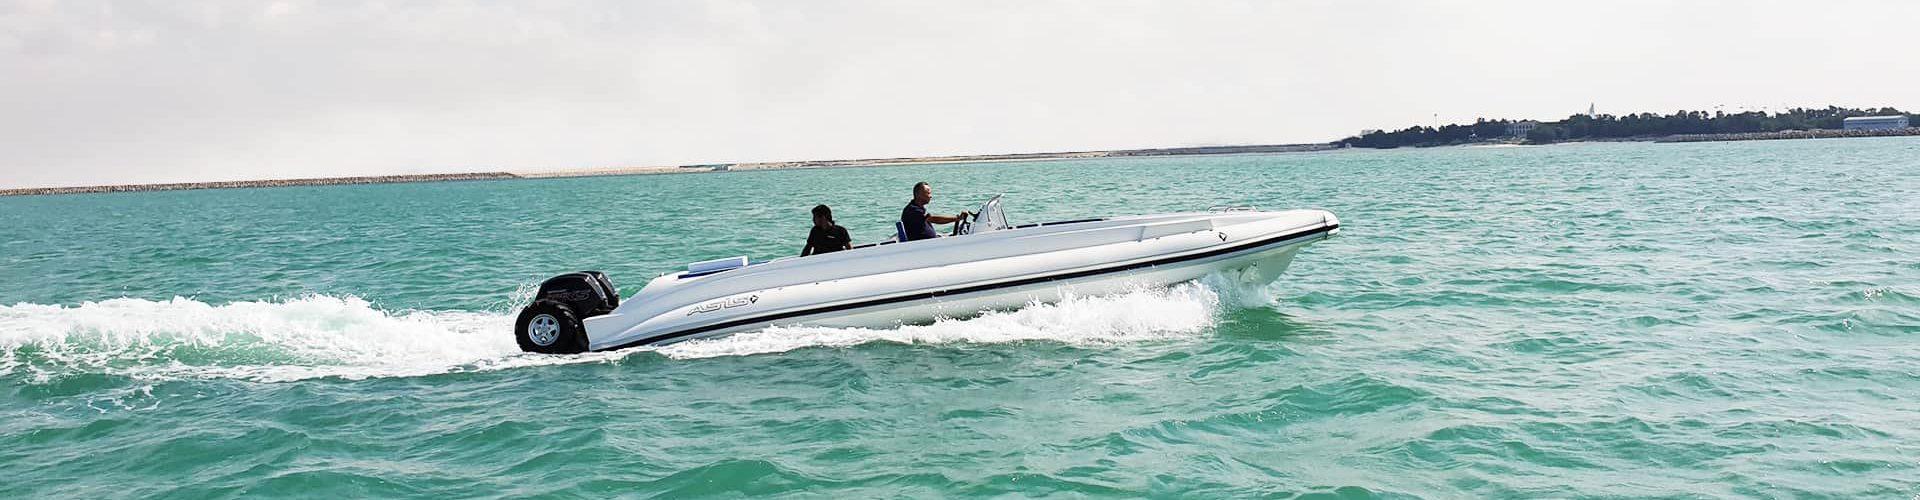 header-recreational-beachlander-9.5m-amphibious-1920x500